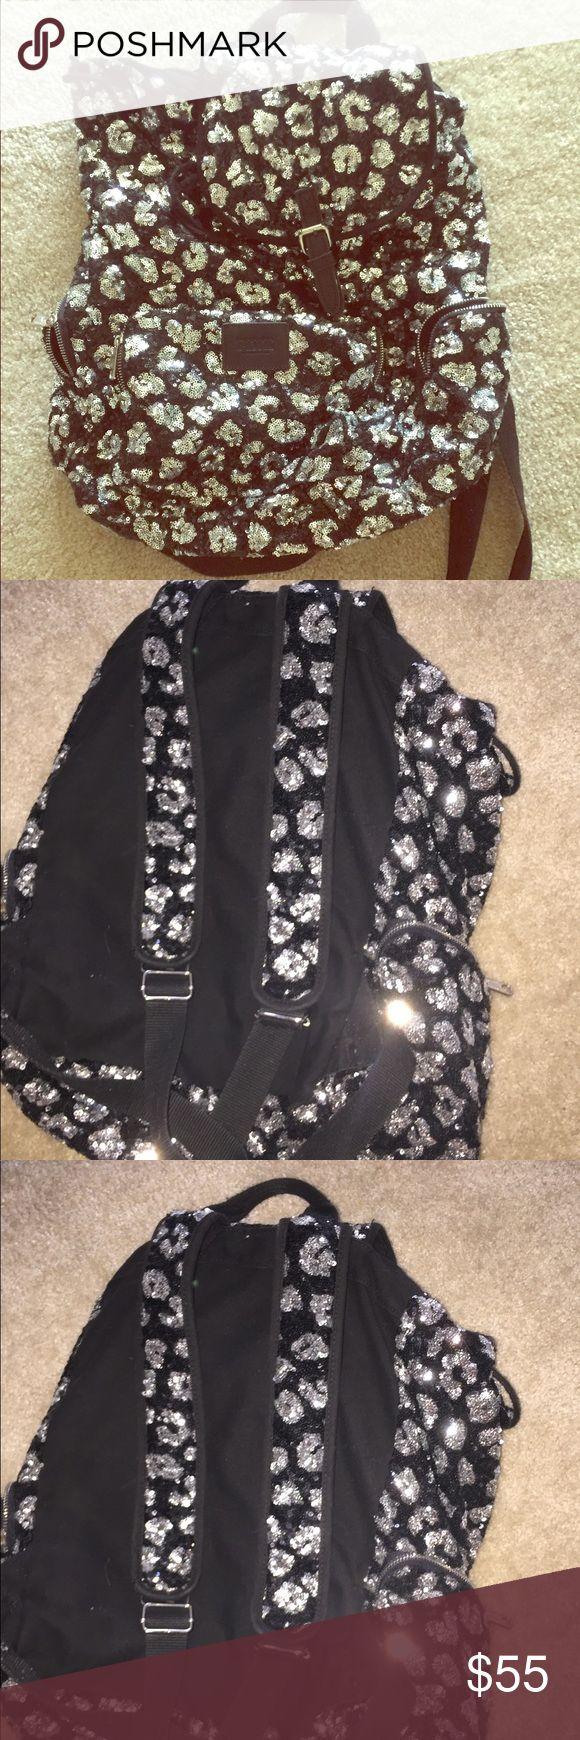 Victoria's Secret pink silver blk sequin backpack Like new. Make an offer!! Bundle and save! PINK Victoria's Secret Bags Backpacks